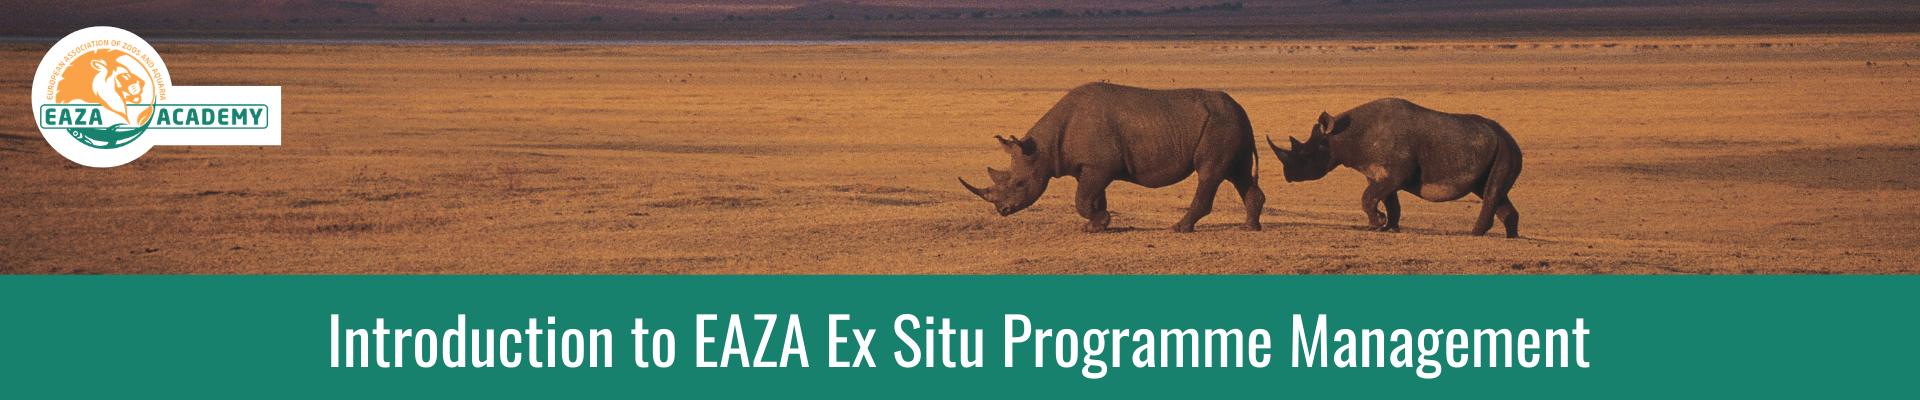 Introduction to EAZA Ex situ Programme Management_November